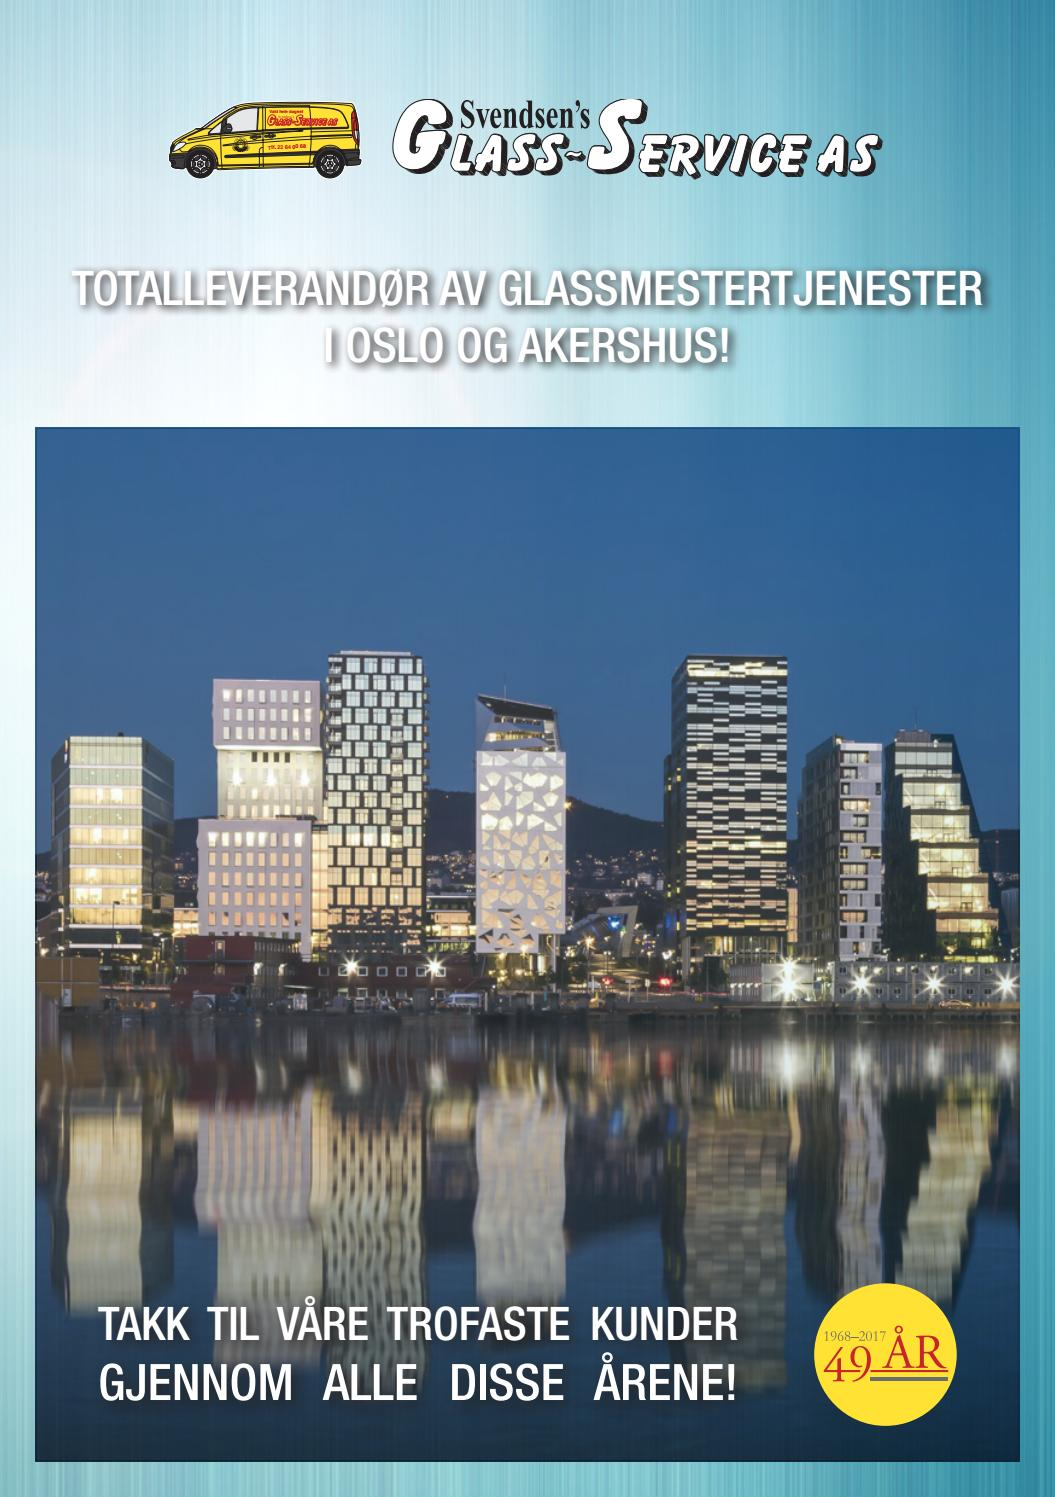 Svendsens glass service as